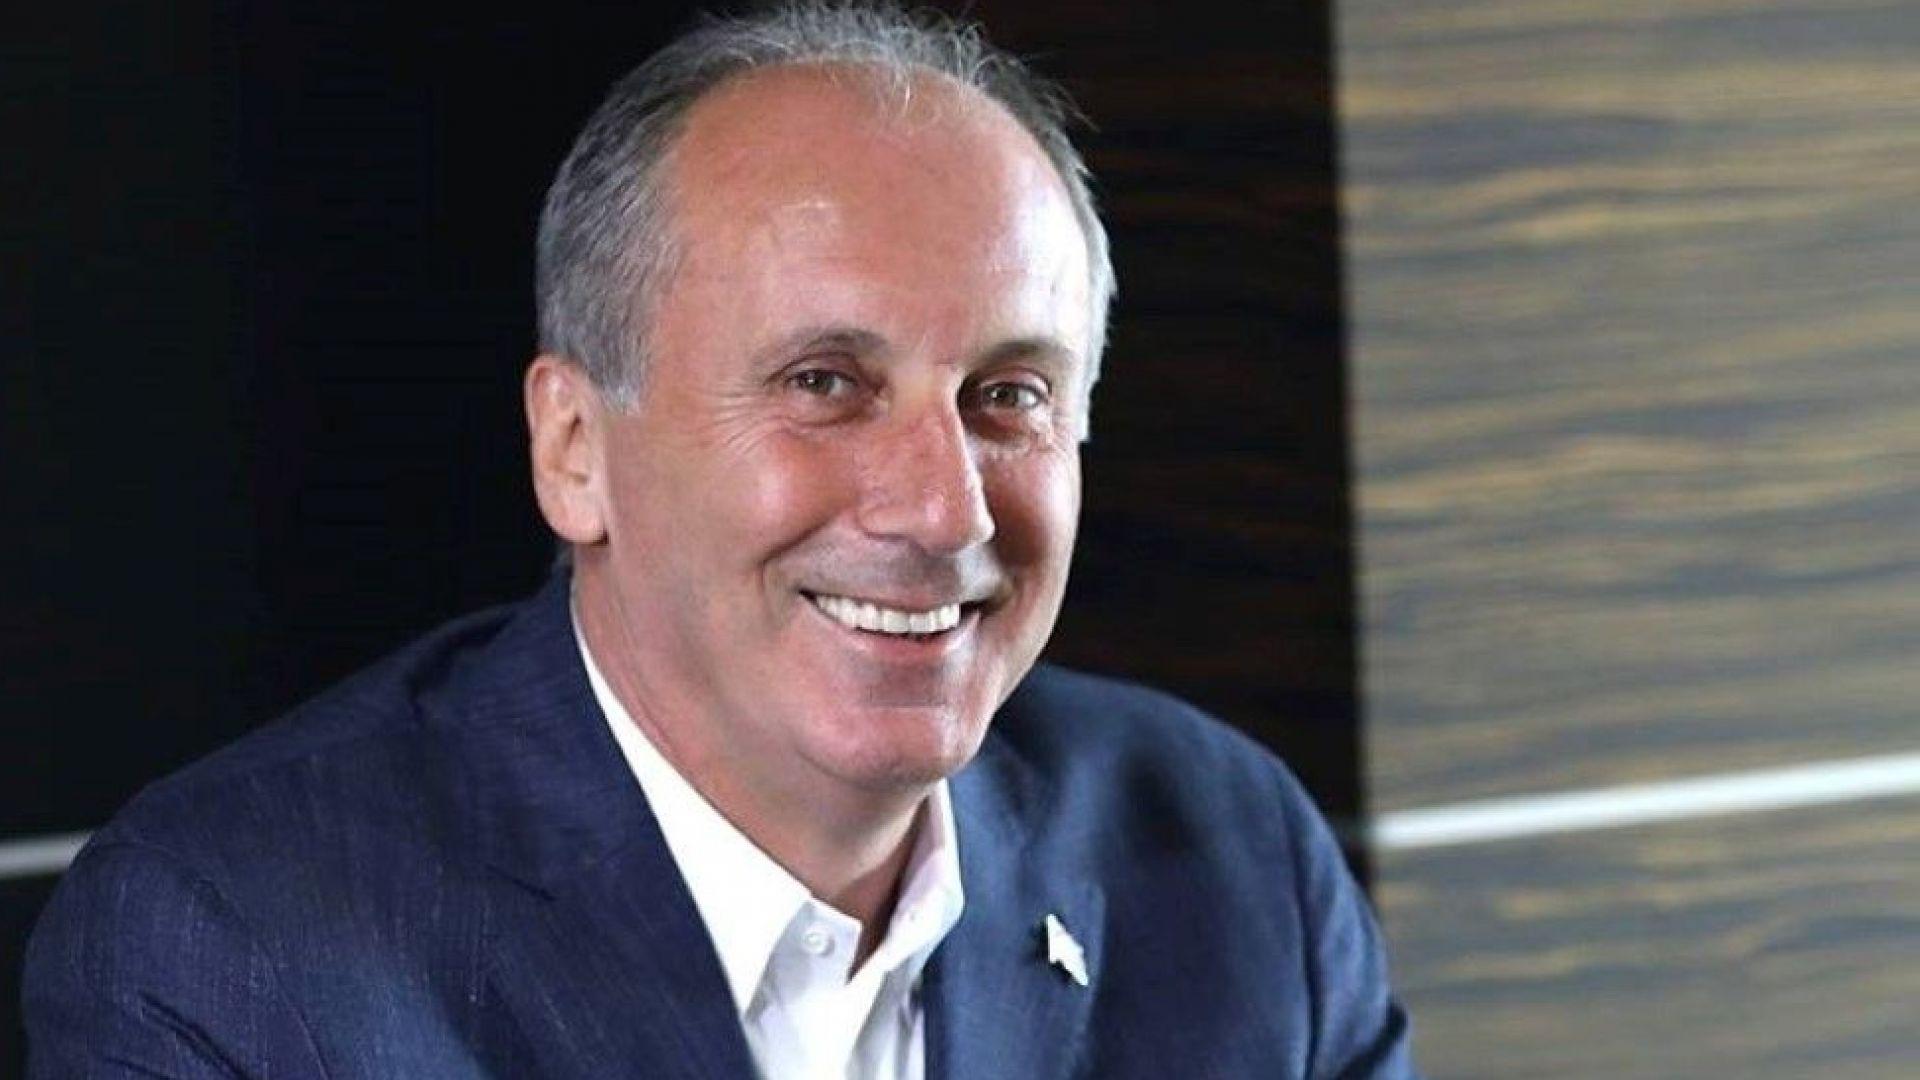 Конкурент на Ердоган на изборите: Той е бял турчин